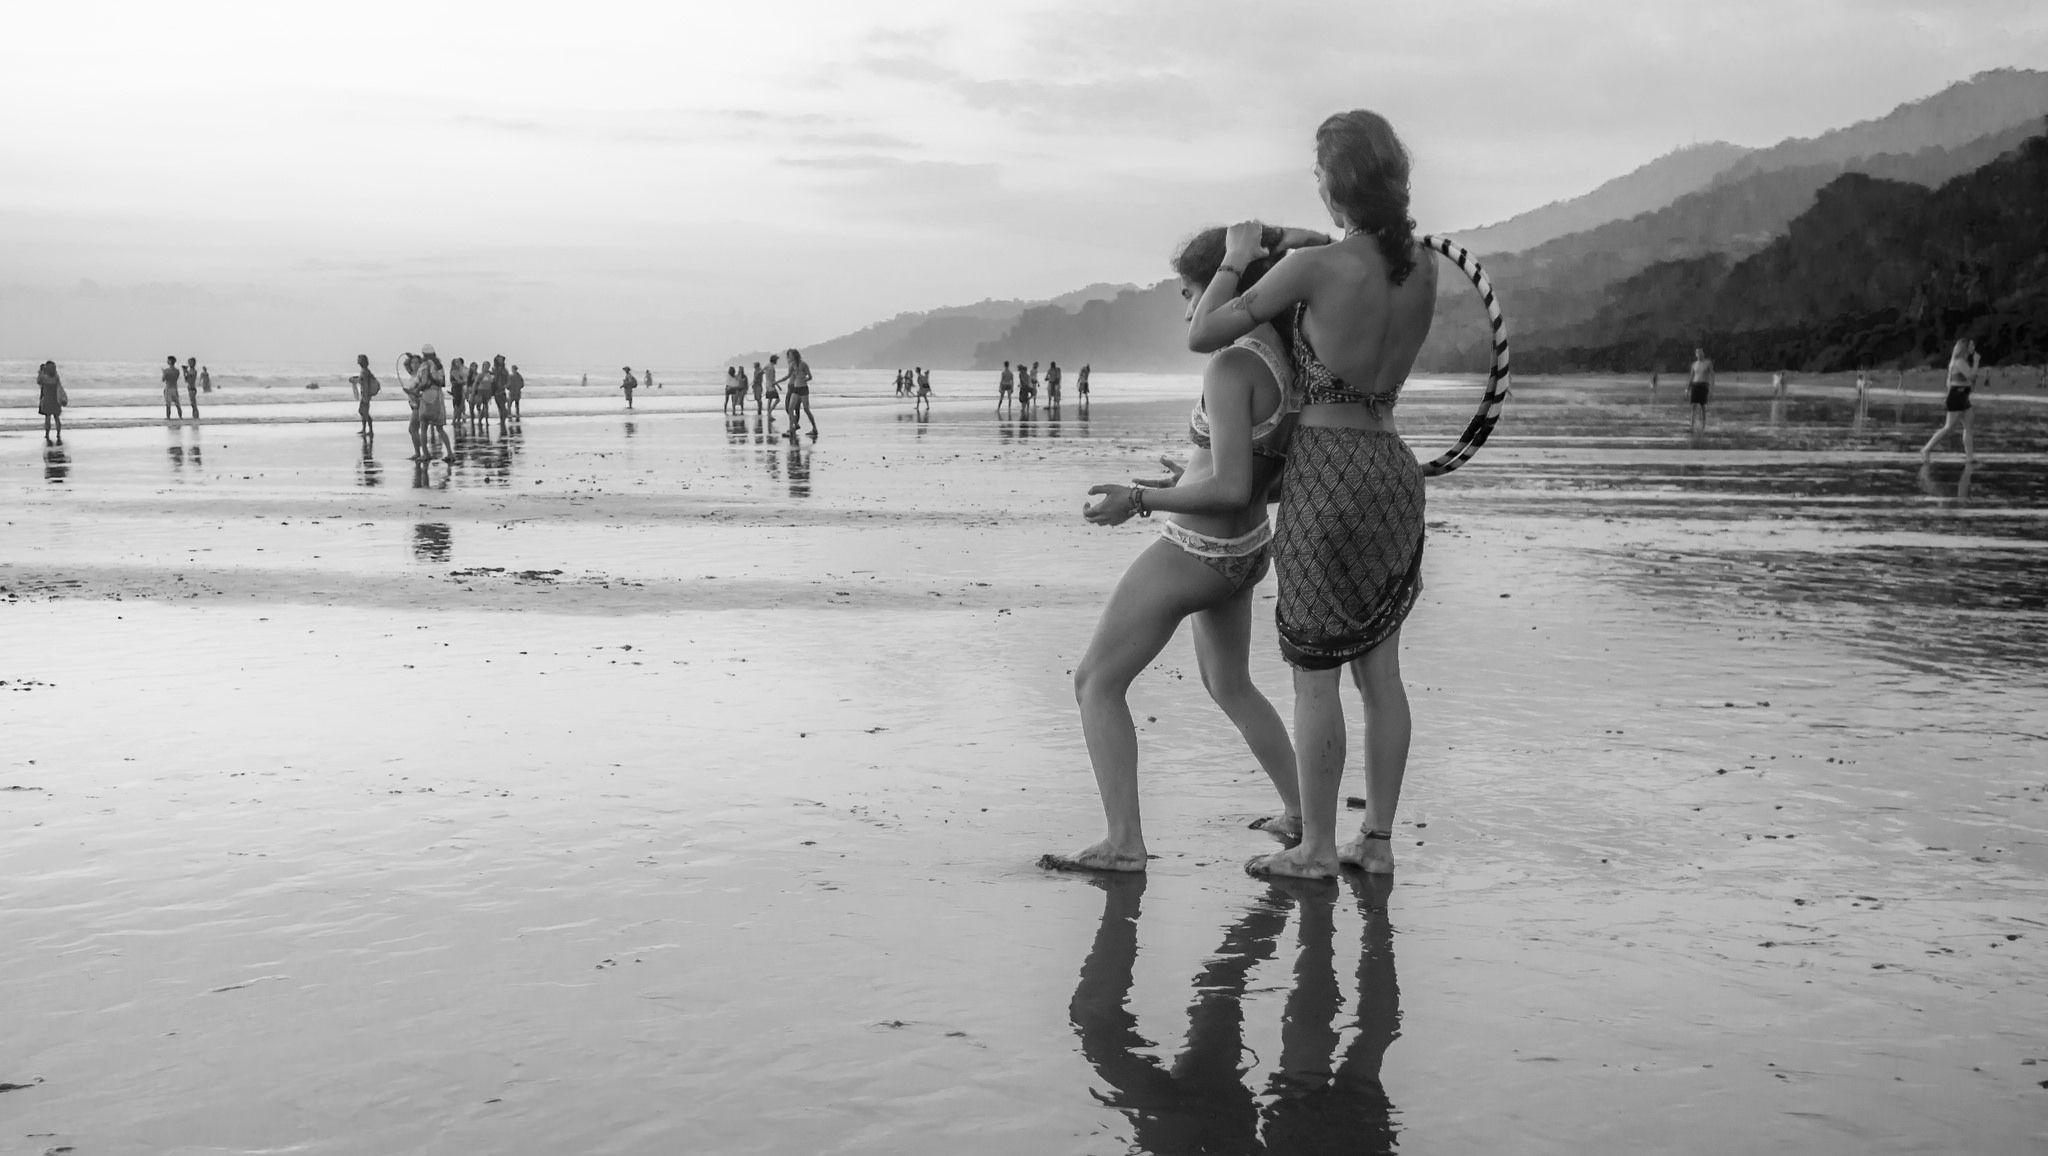 beaching | by Cyril Jezek Photography